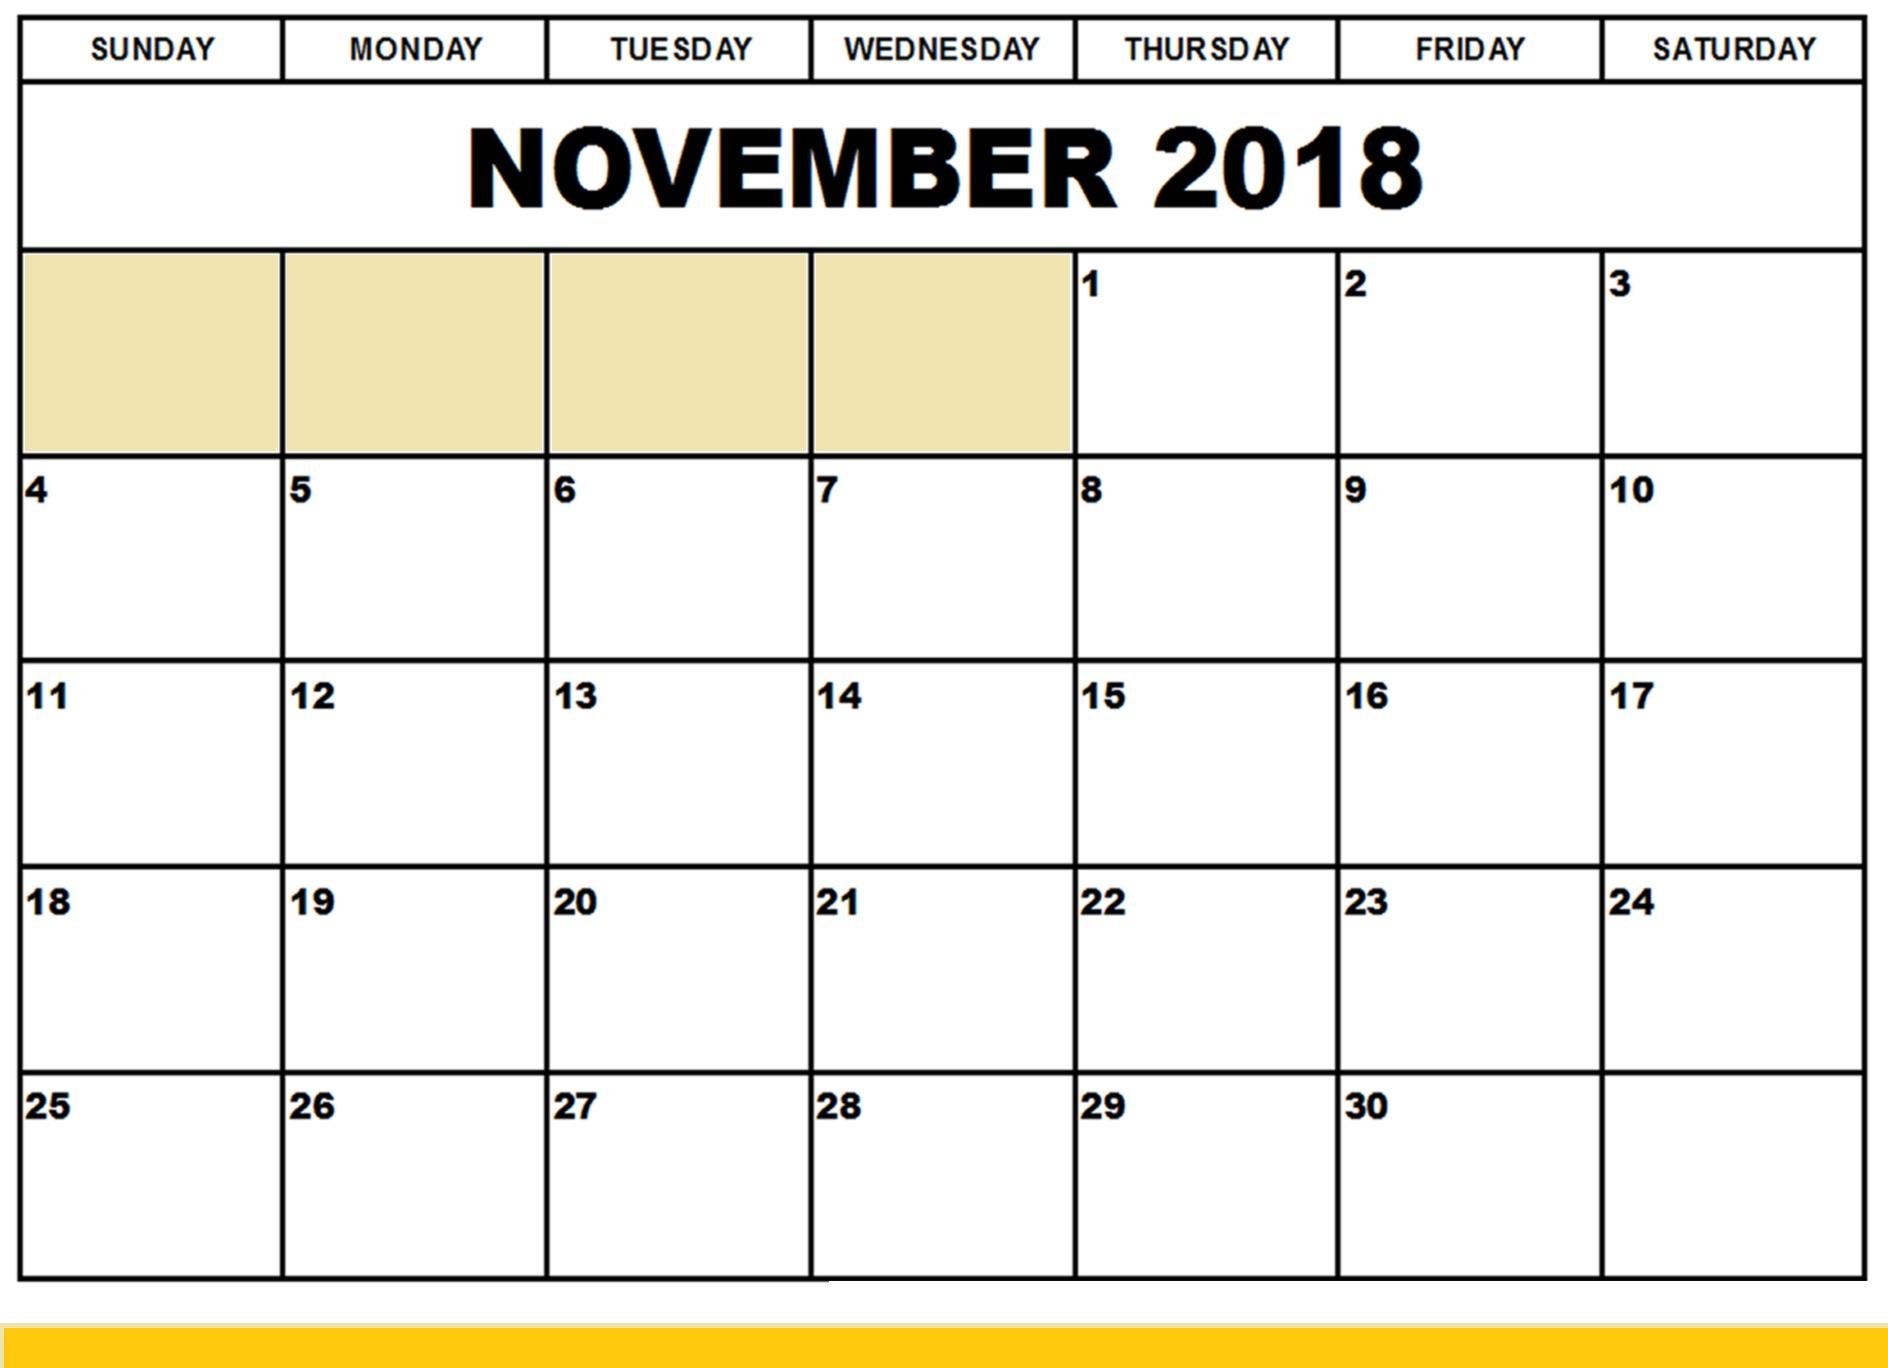 November 2018 Calendar Printable Templates Free Download inside November Calendar Template Free